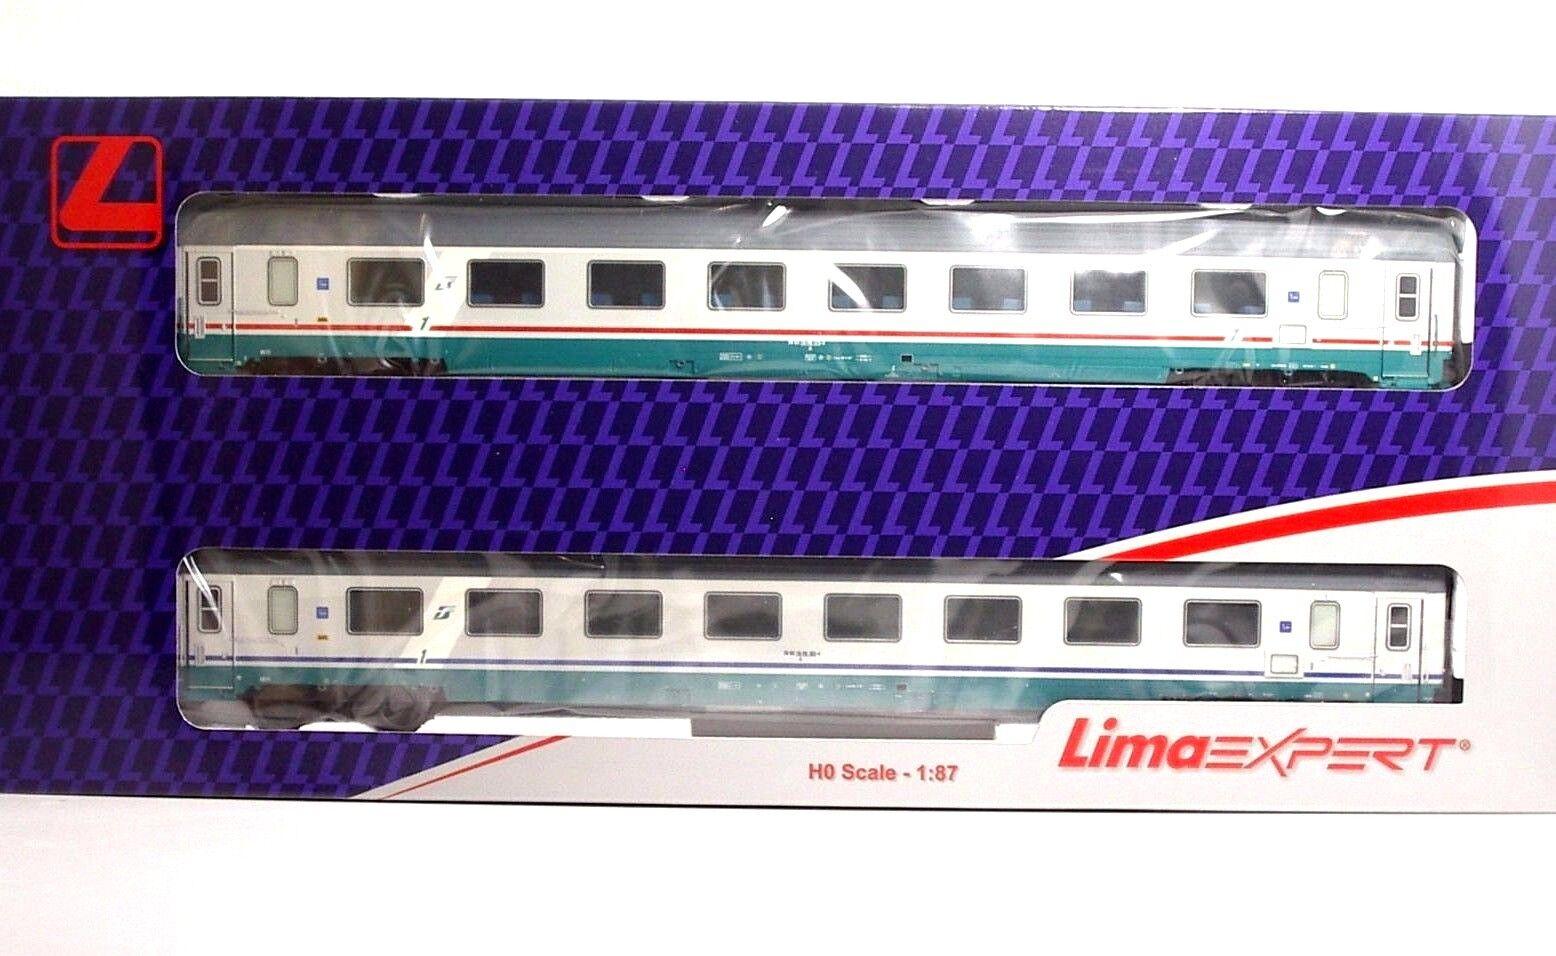 LIMA EXPERT HL5005 Set 2 carrozze Gran Confort serie '88 livrea XMPR 1 Ep.V